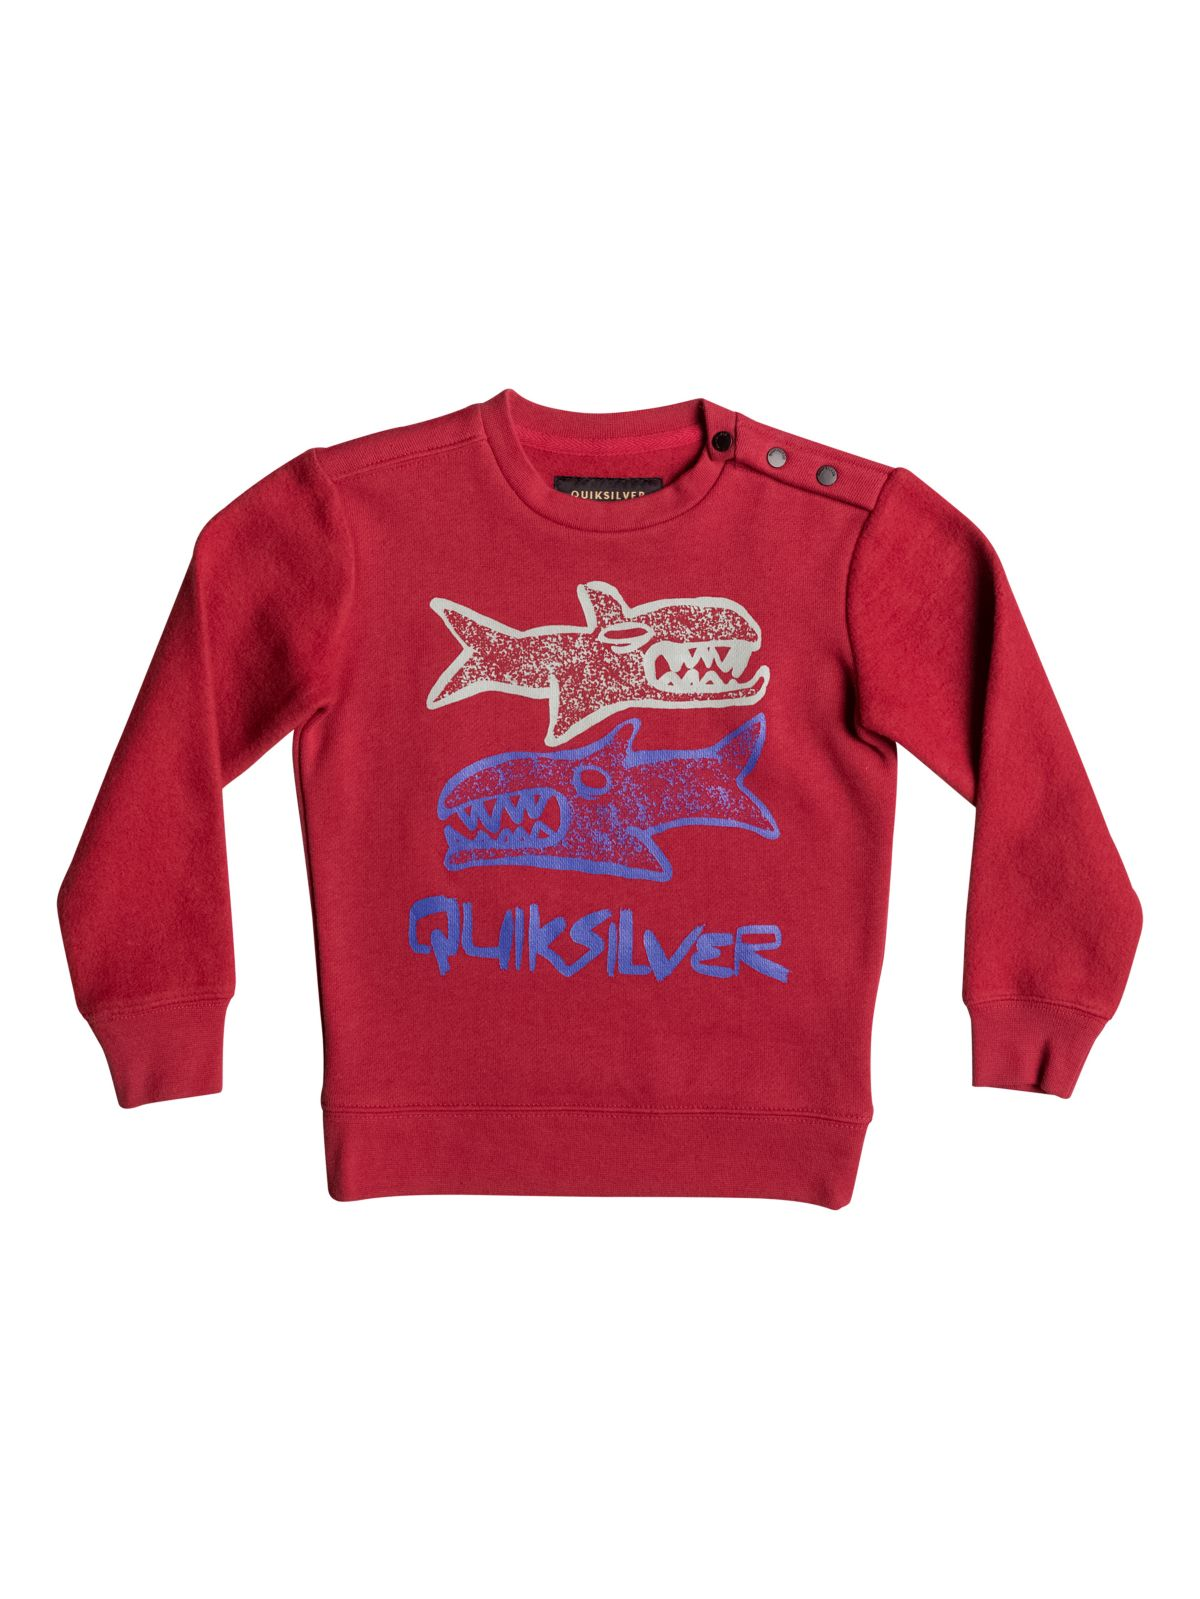 Quiksilver Sweatshirt  Double Sharks  Preisvergleich